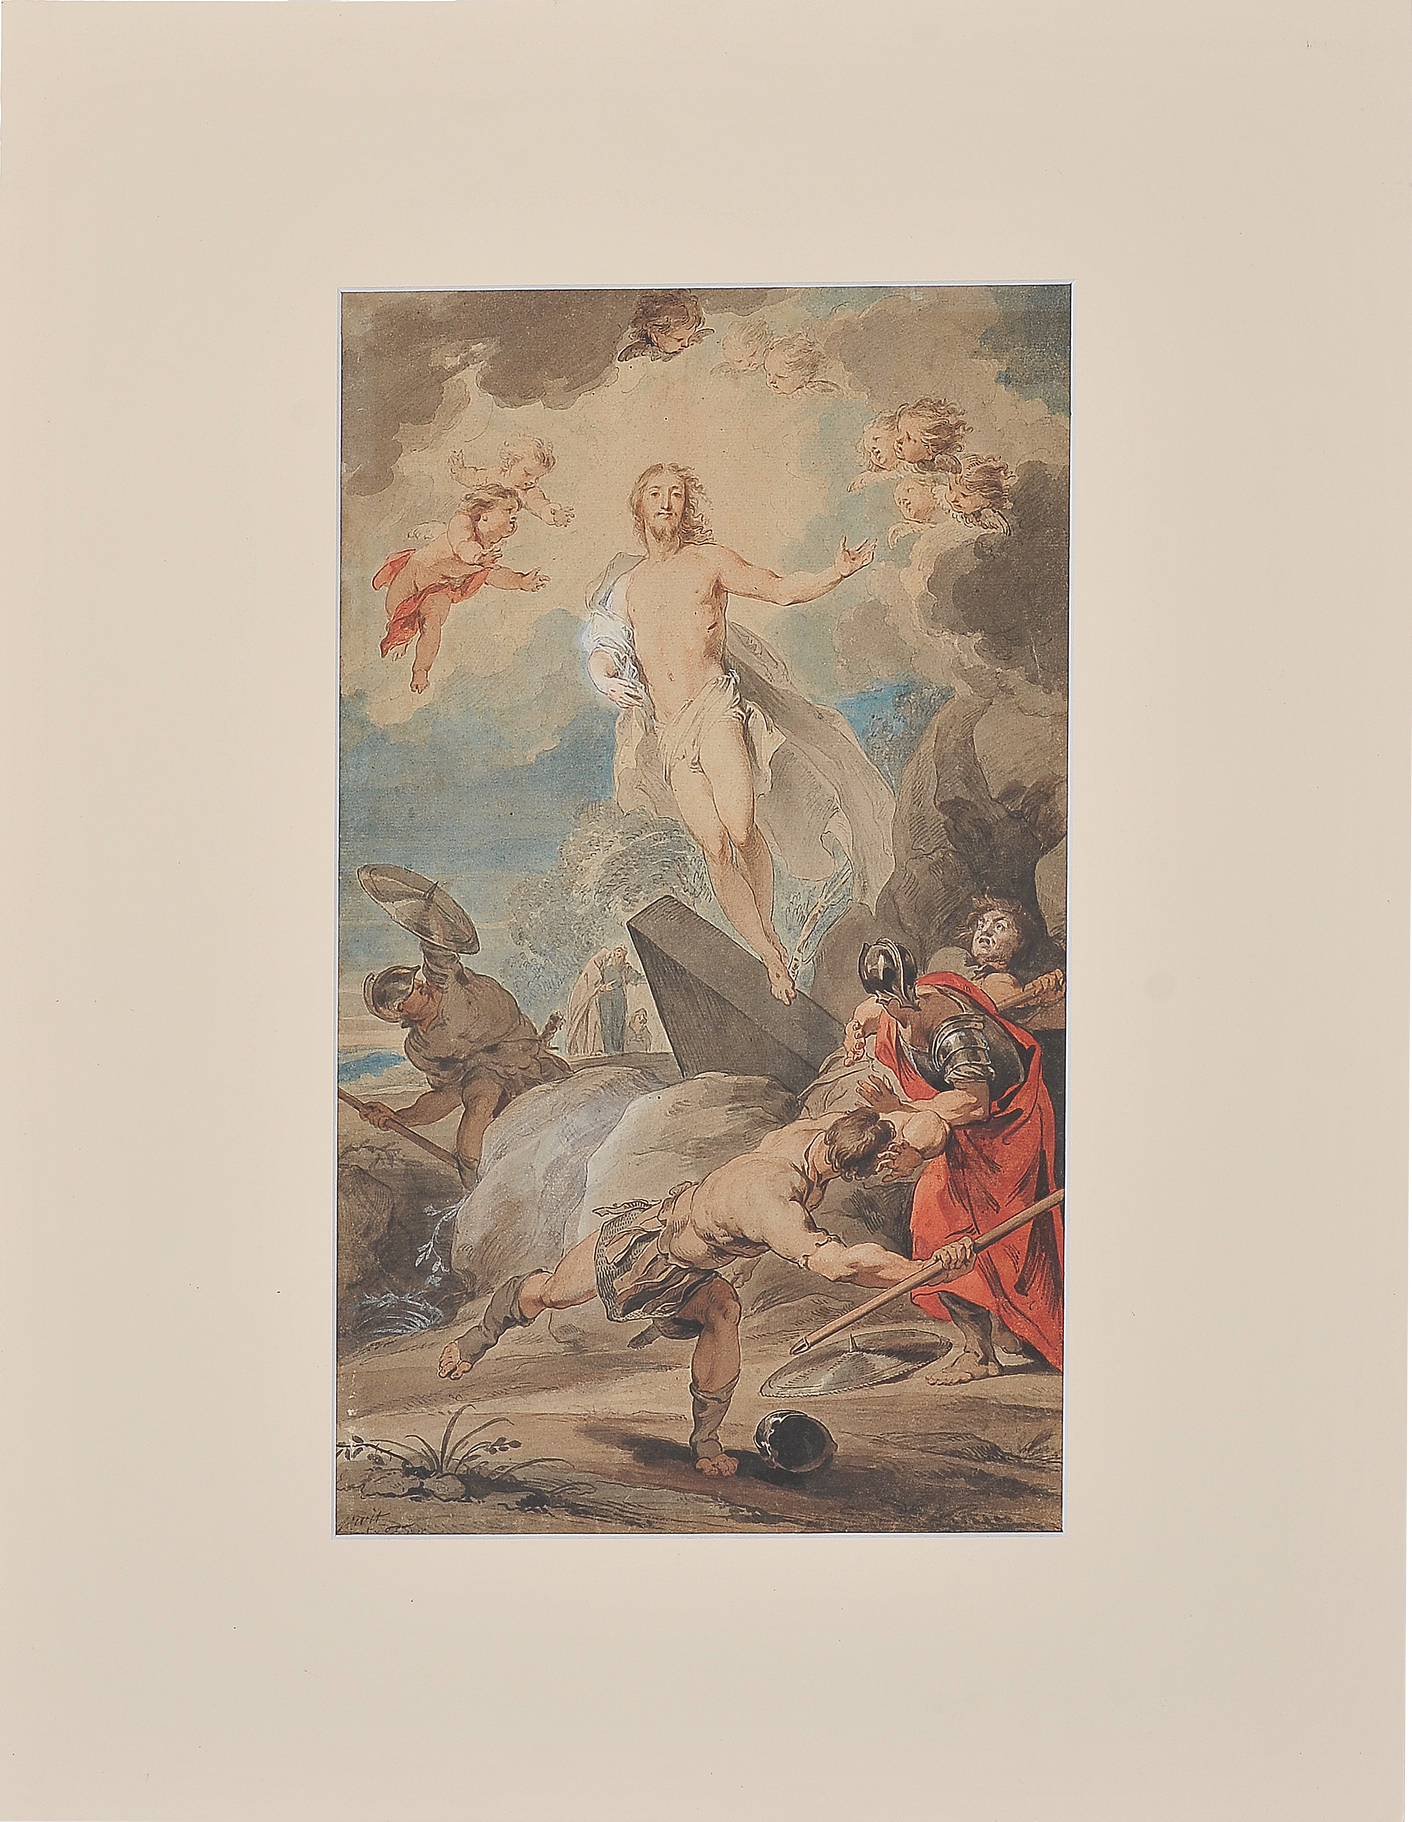 Jakob de Witt, Amsterdam 1695 - 1754, Auferstehung - Image 7 of 9